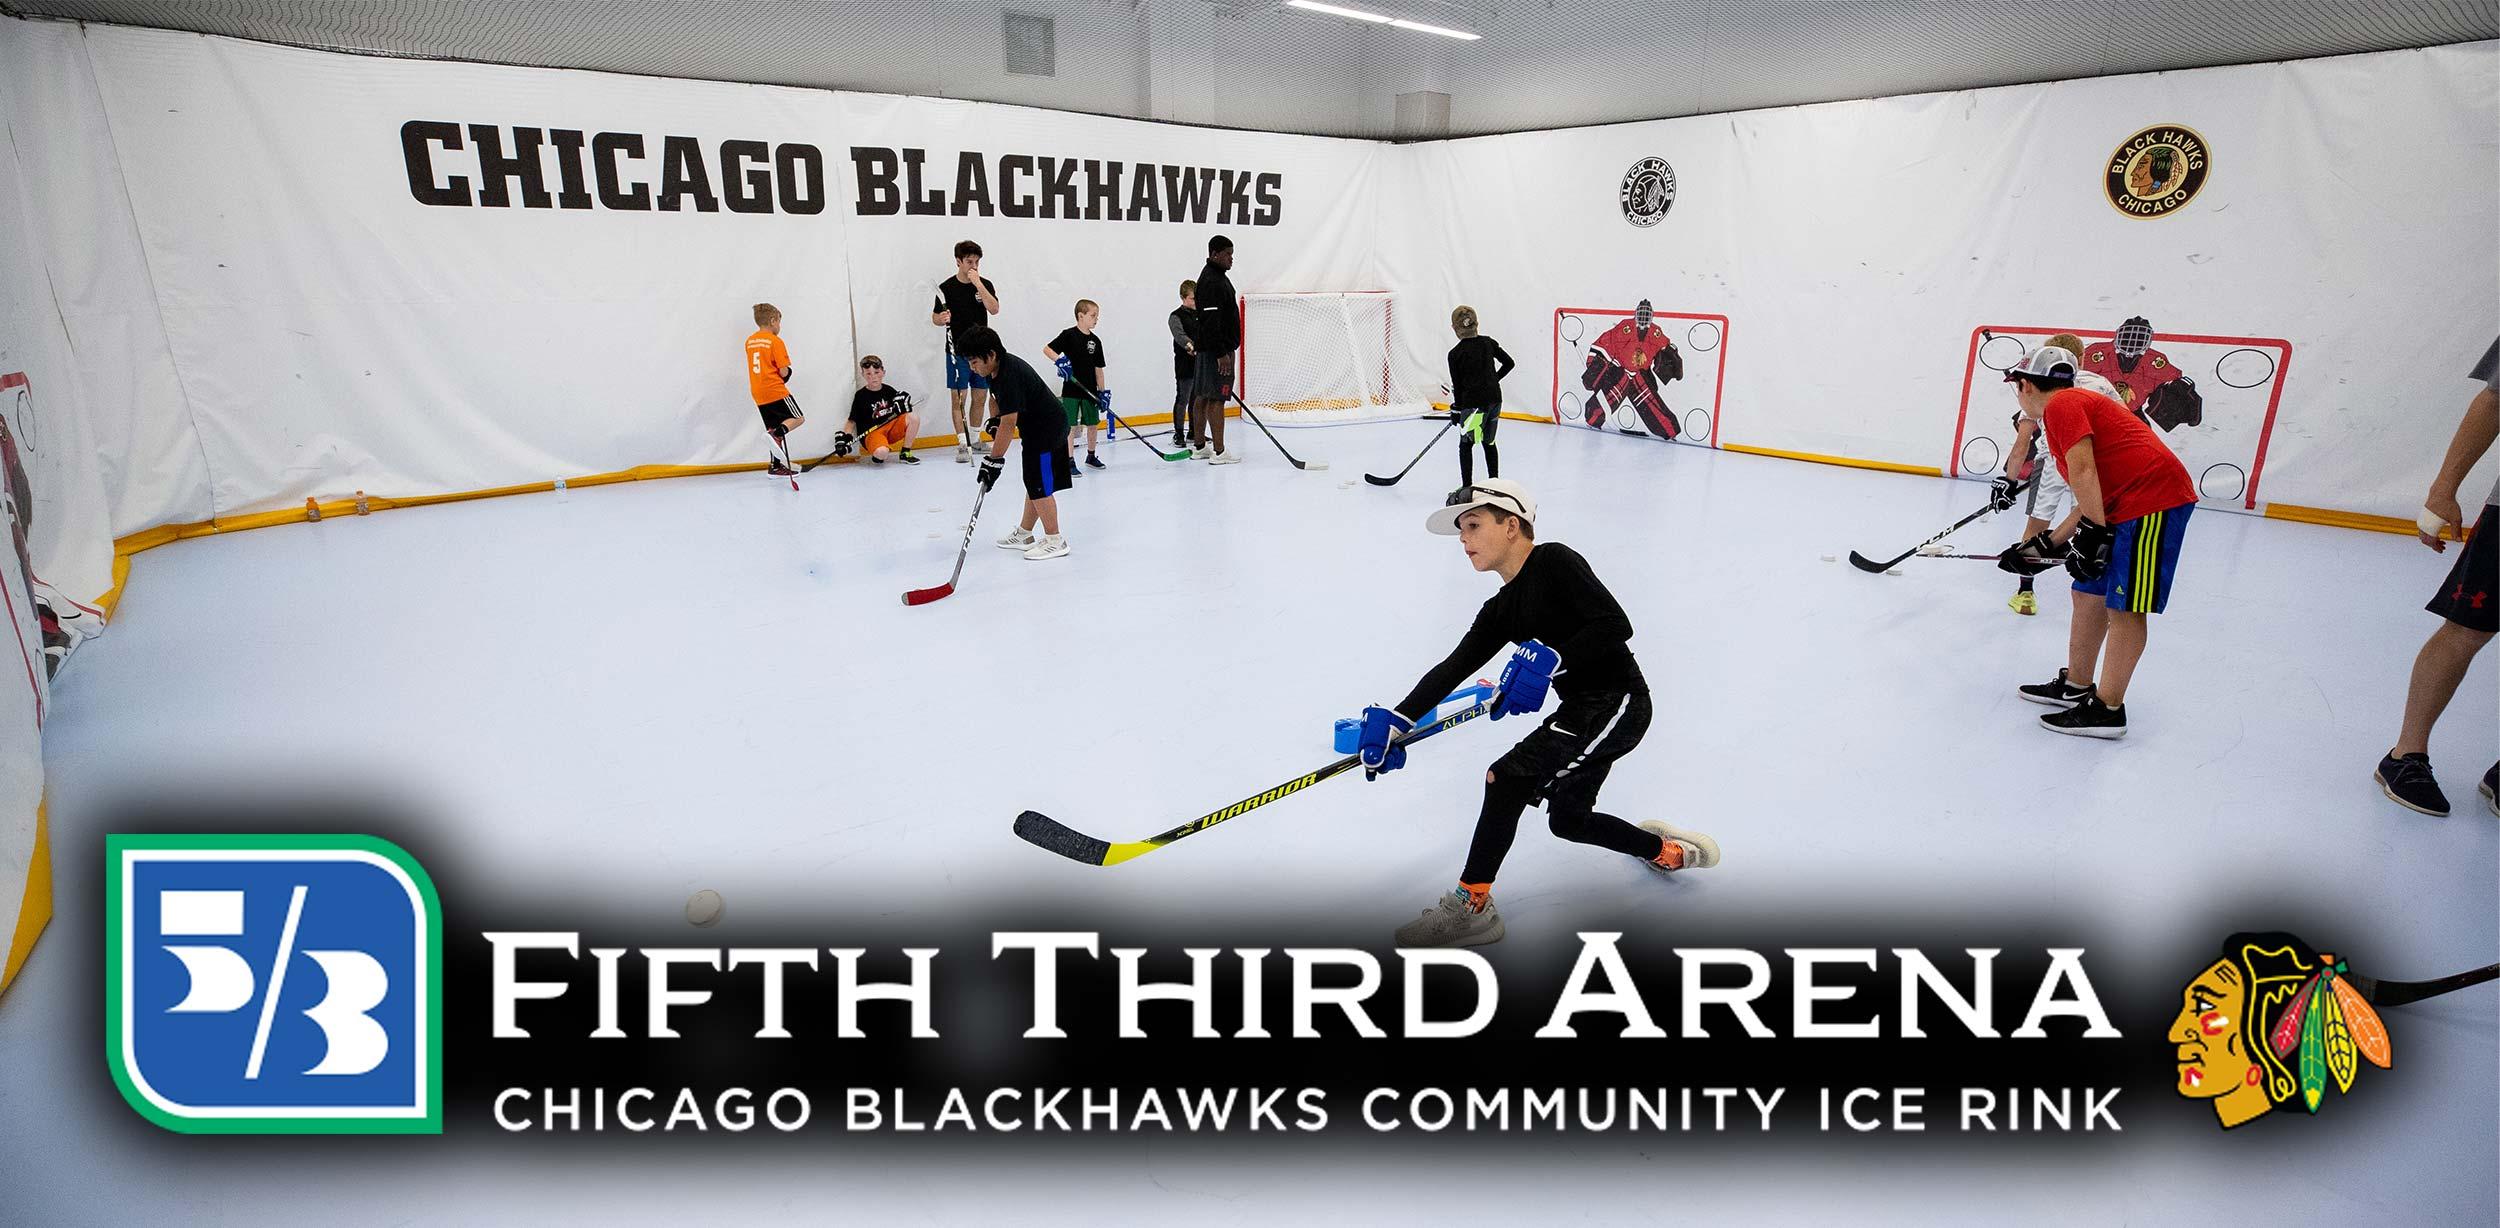 Fifth Third Arena Skills Studio